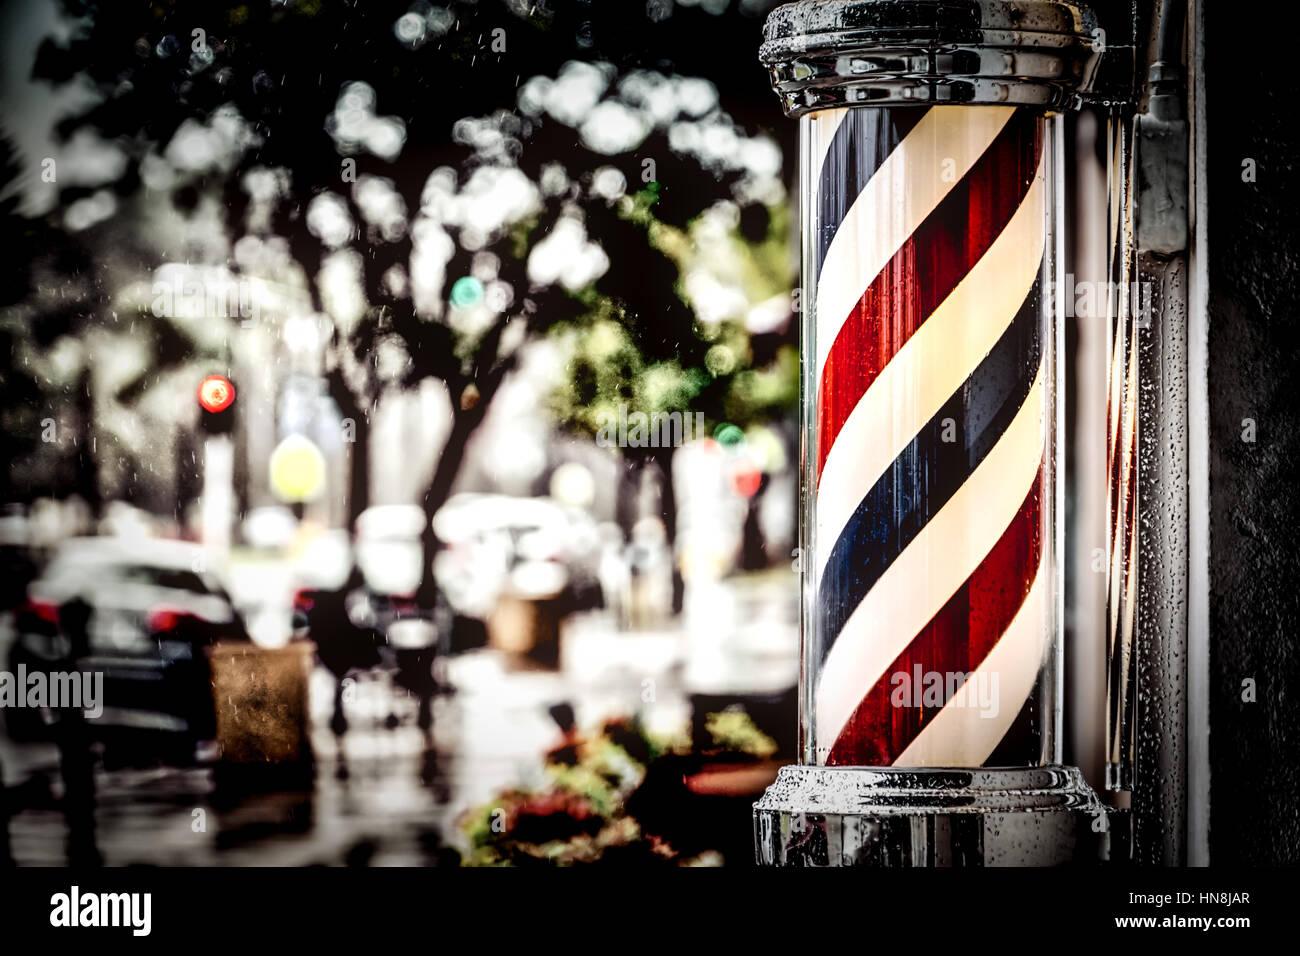 Rain collecting on the barber shop pole at Island Barbers in Coronado, California. - Stock Image